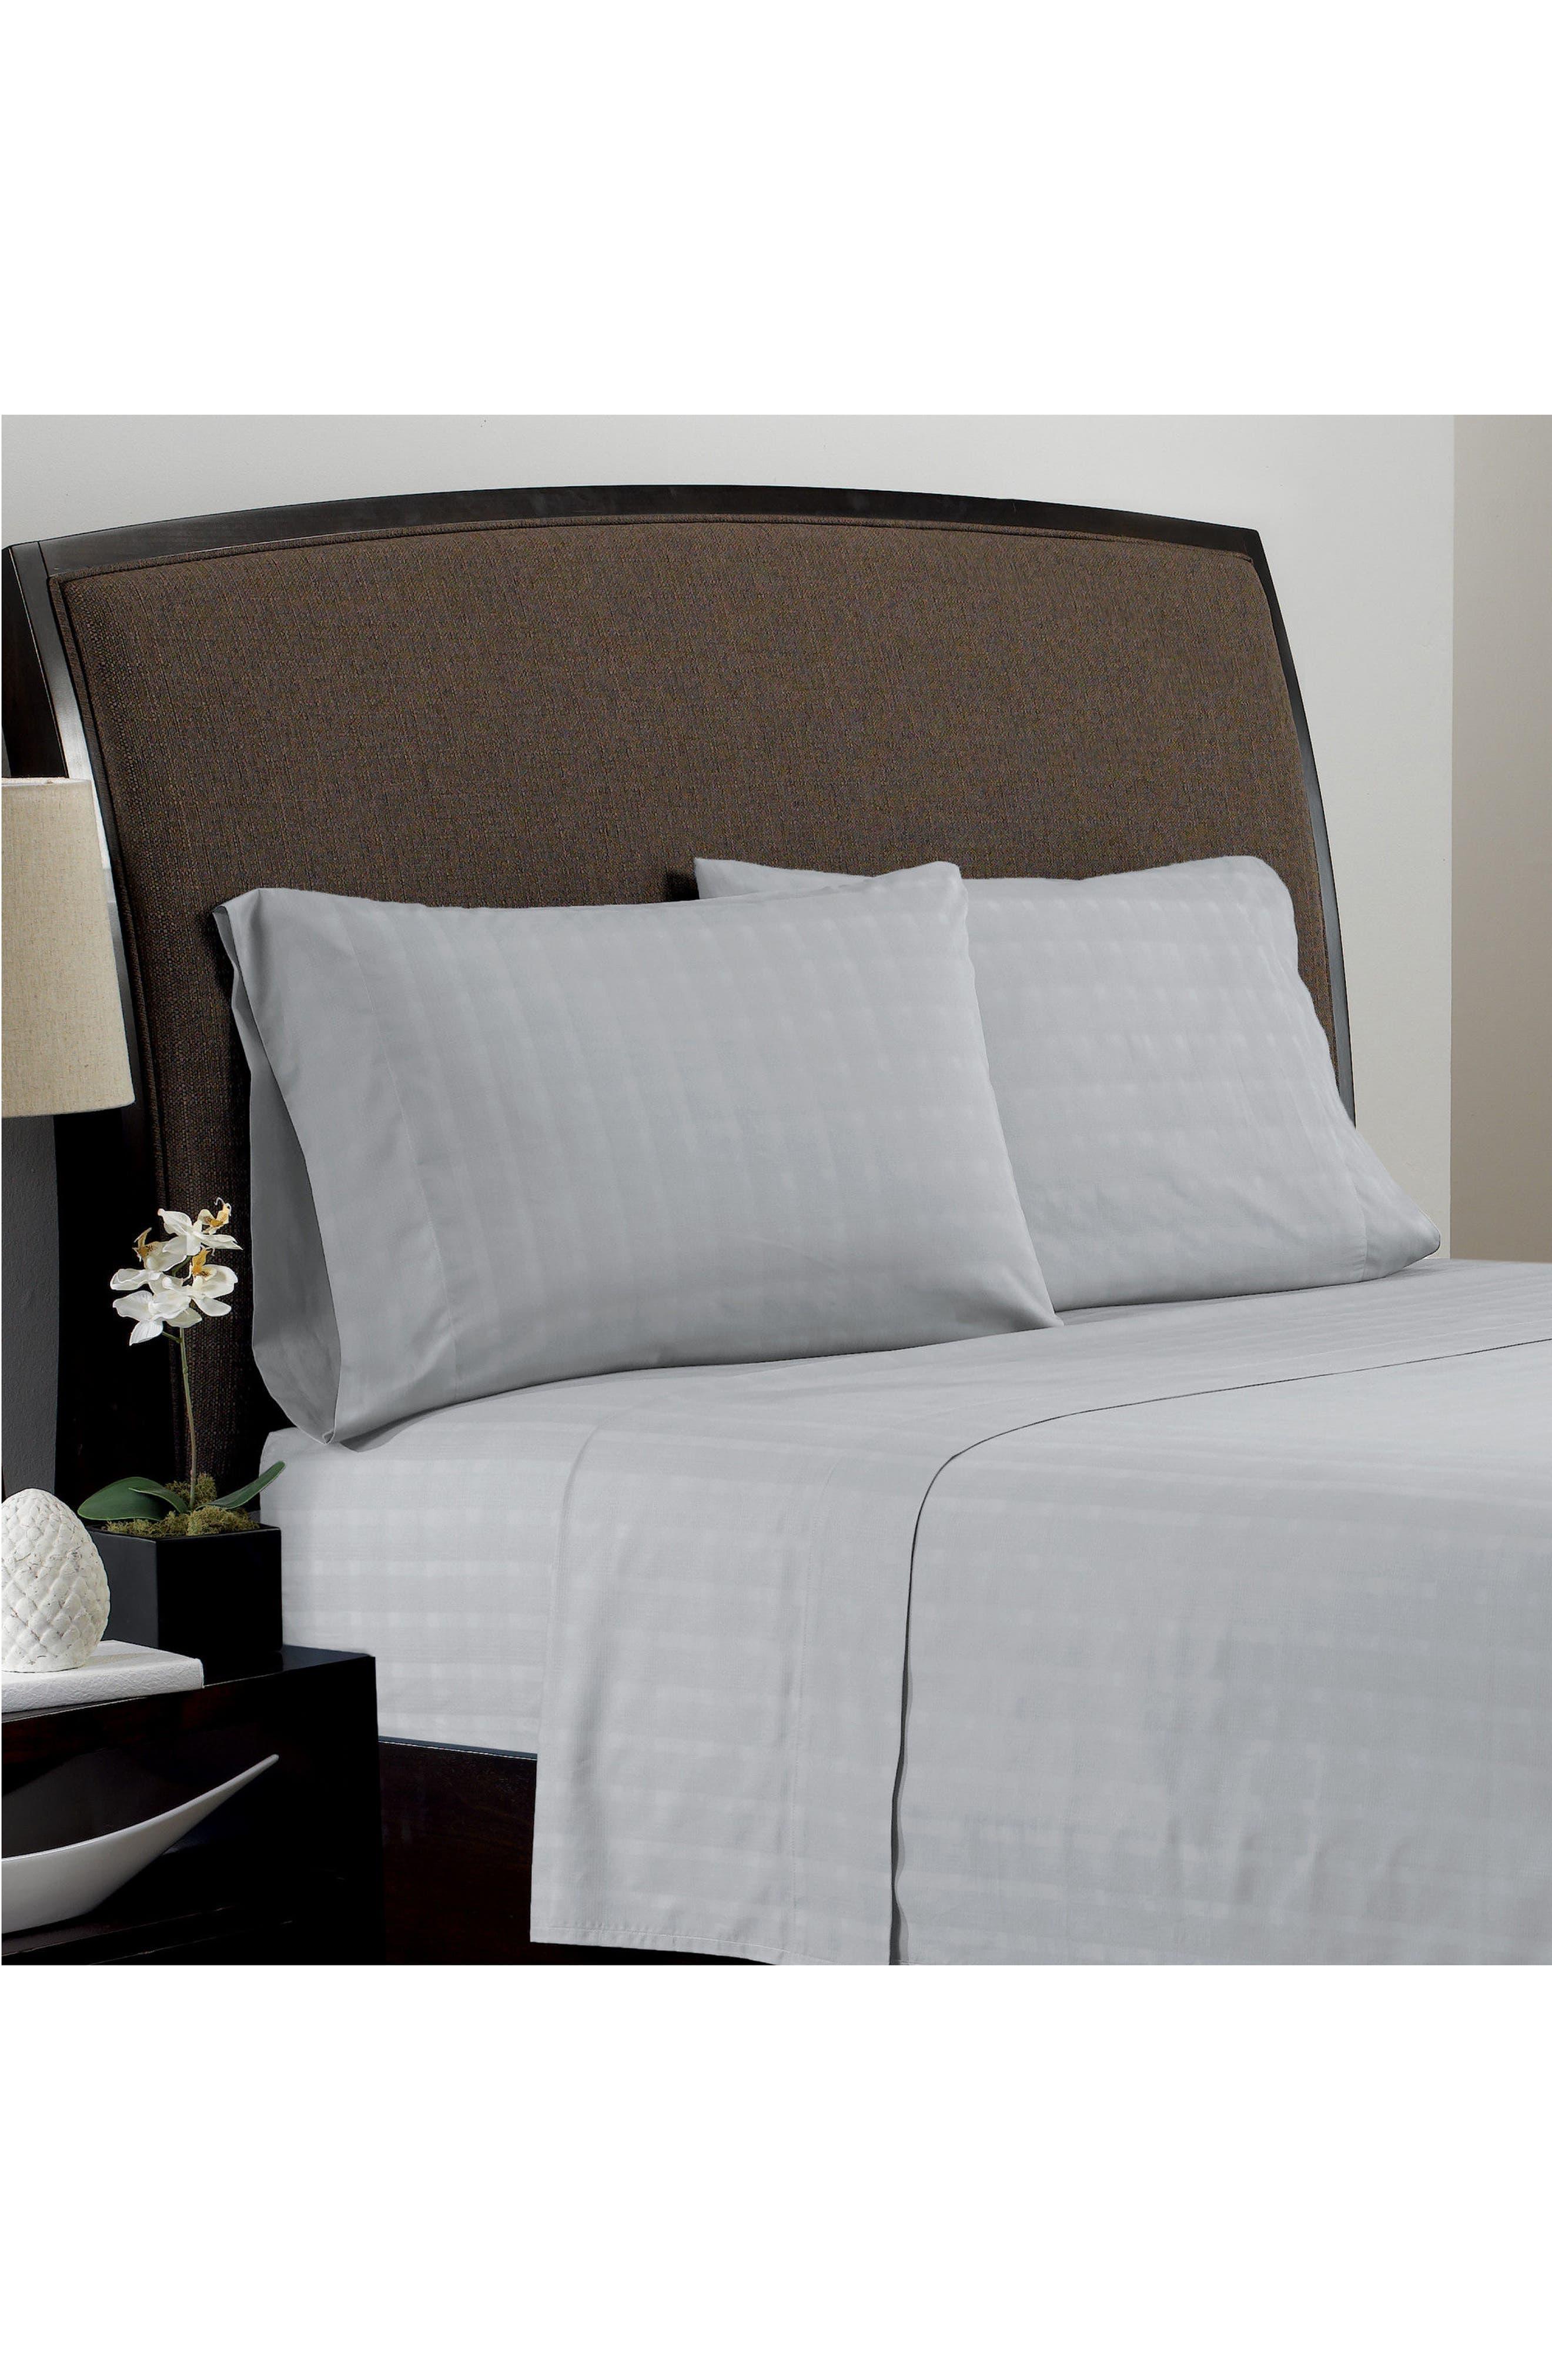 Dobby Plaid Pillowcases,                             Main thumbnail 1, color,                             020